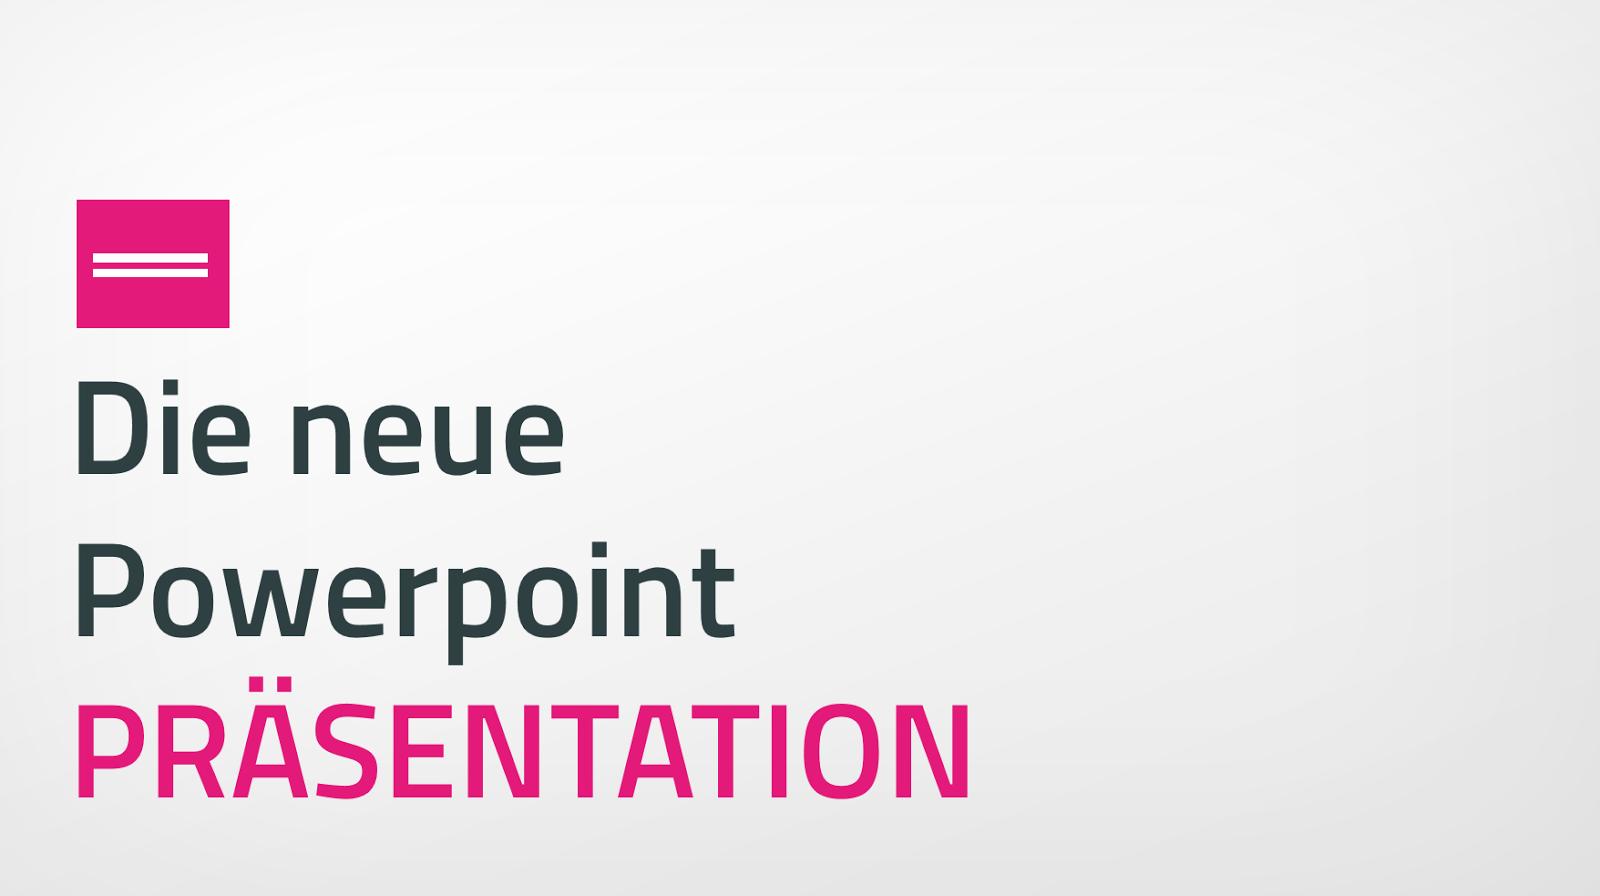 PräsentationsProfi: PPP - Powerpoint Präsentation Folienvorlage